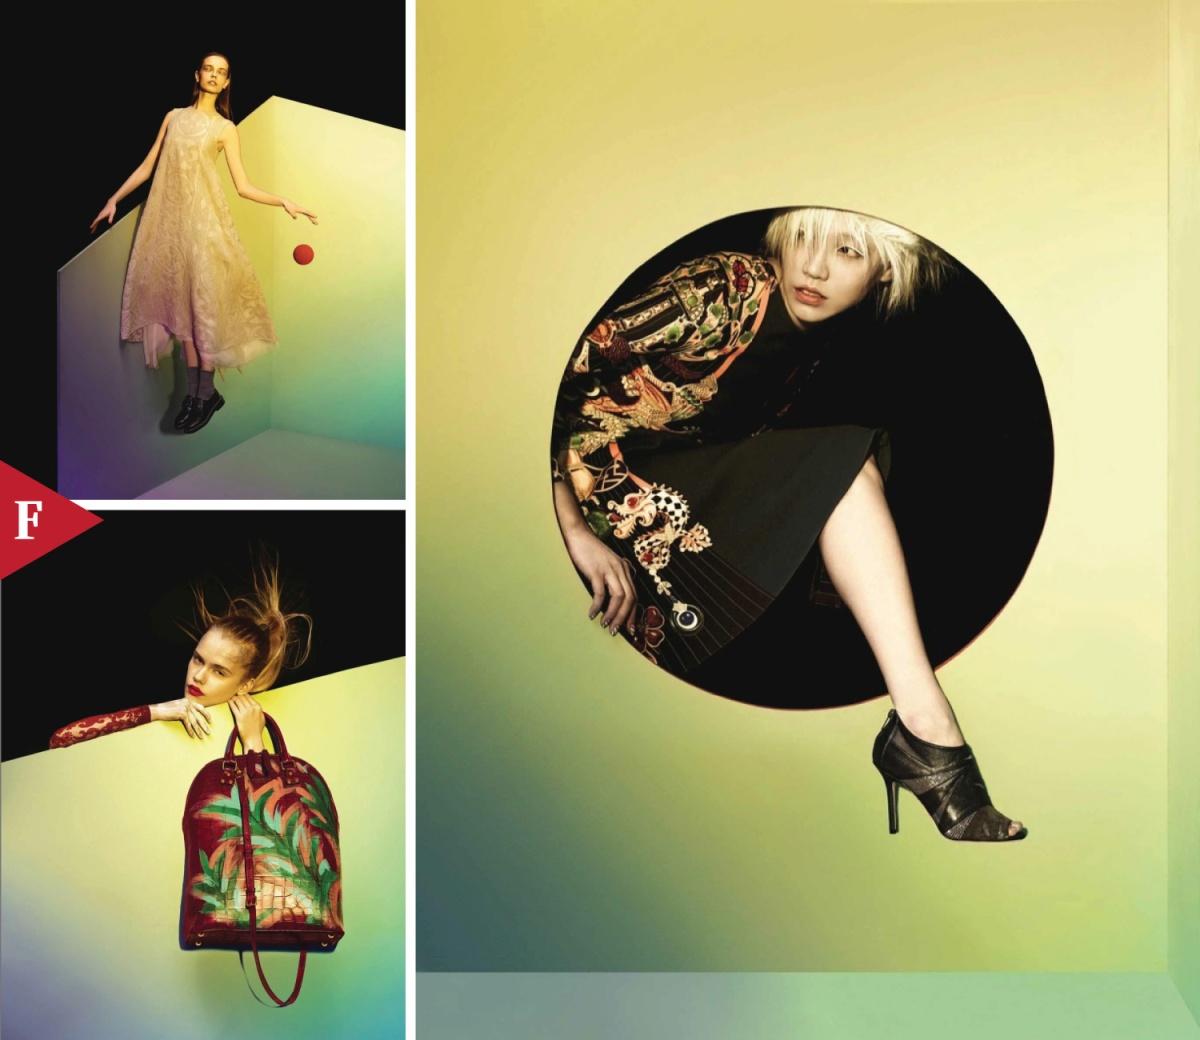 #FashionPortfolio @h_marks @Lalaribeiro16 @soojoo @mirte_maas @brutenorio_real @zimzimzimmer_a @VladaReal - @neimanmarcus Fall 2014 by @NadavKander